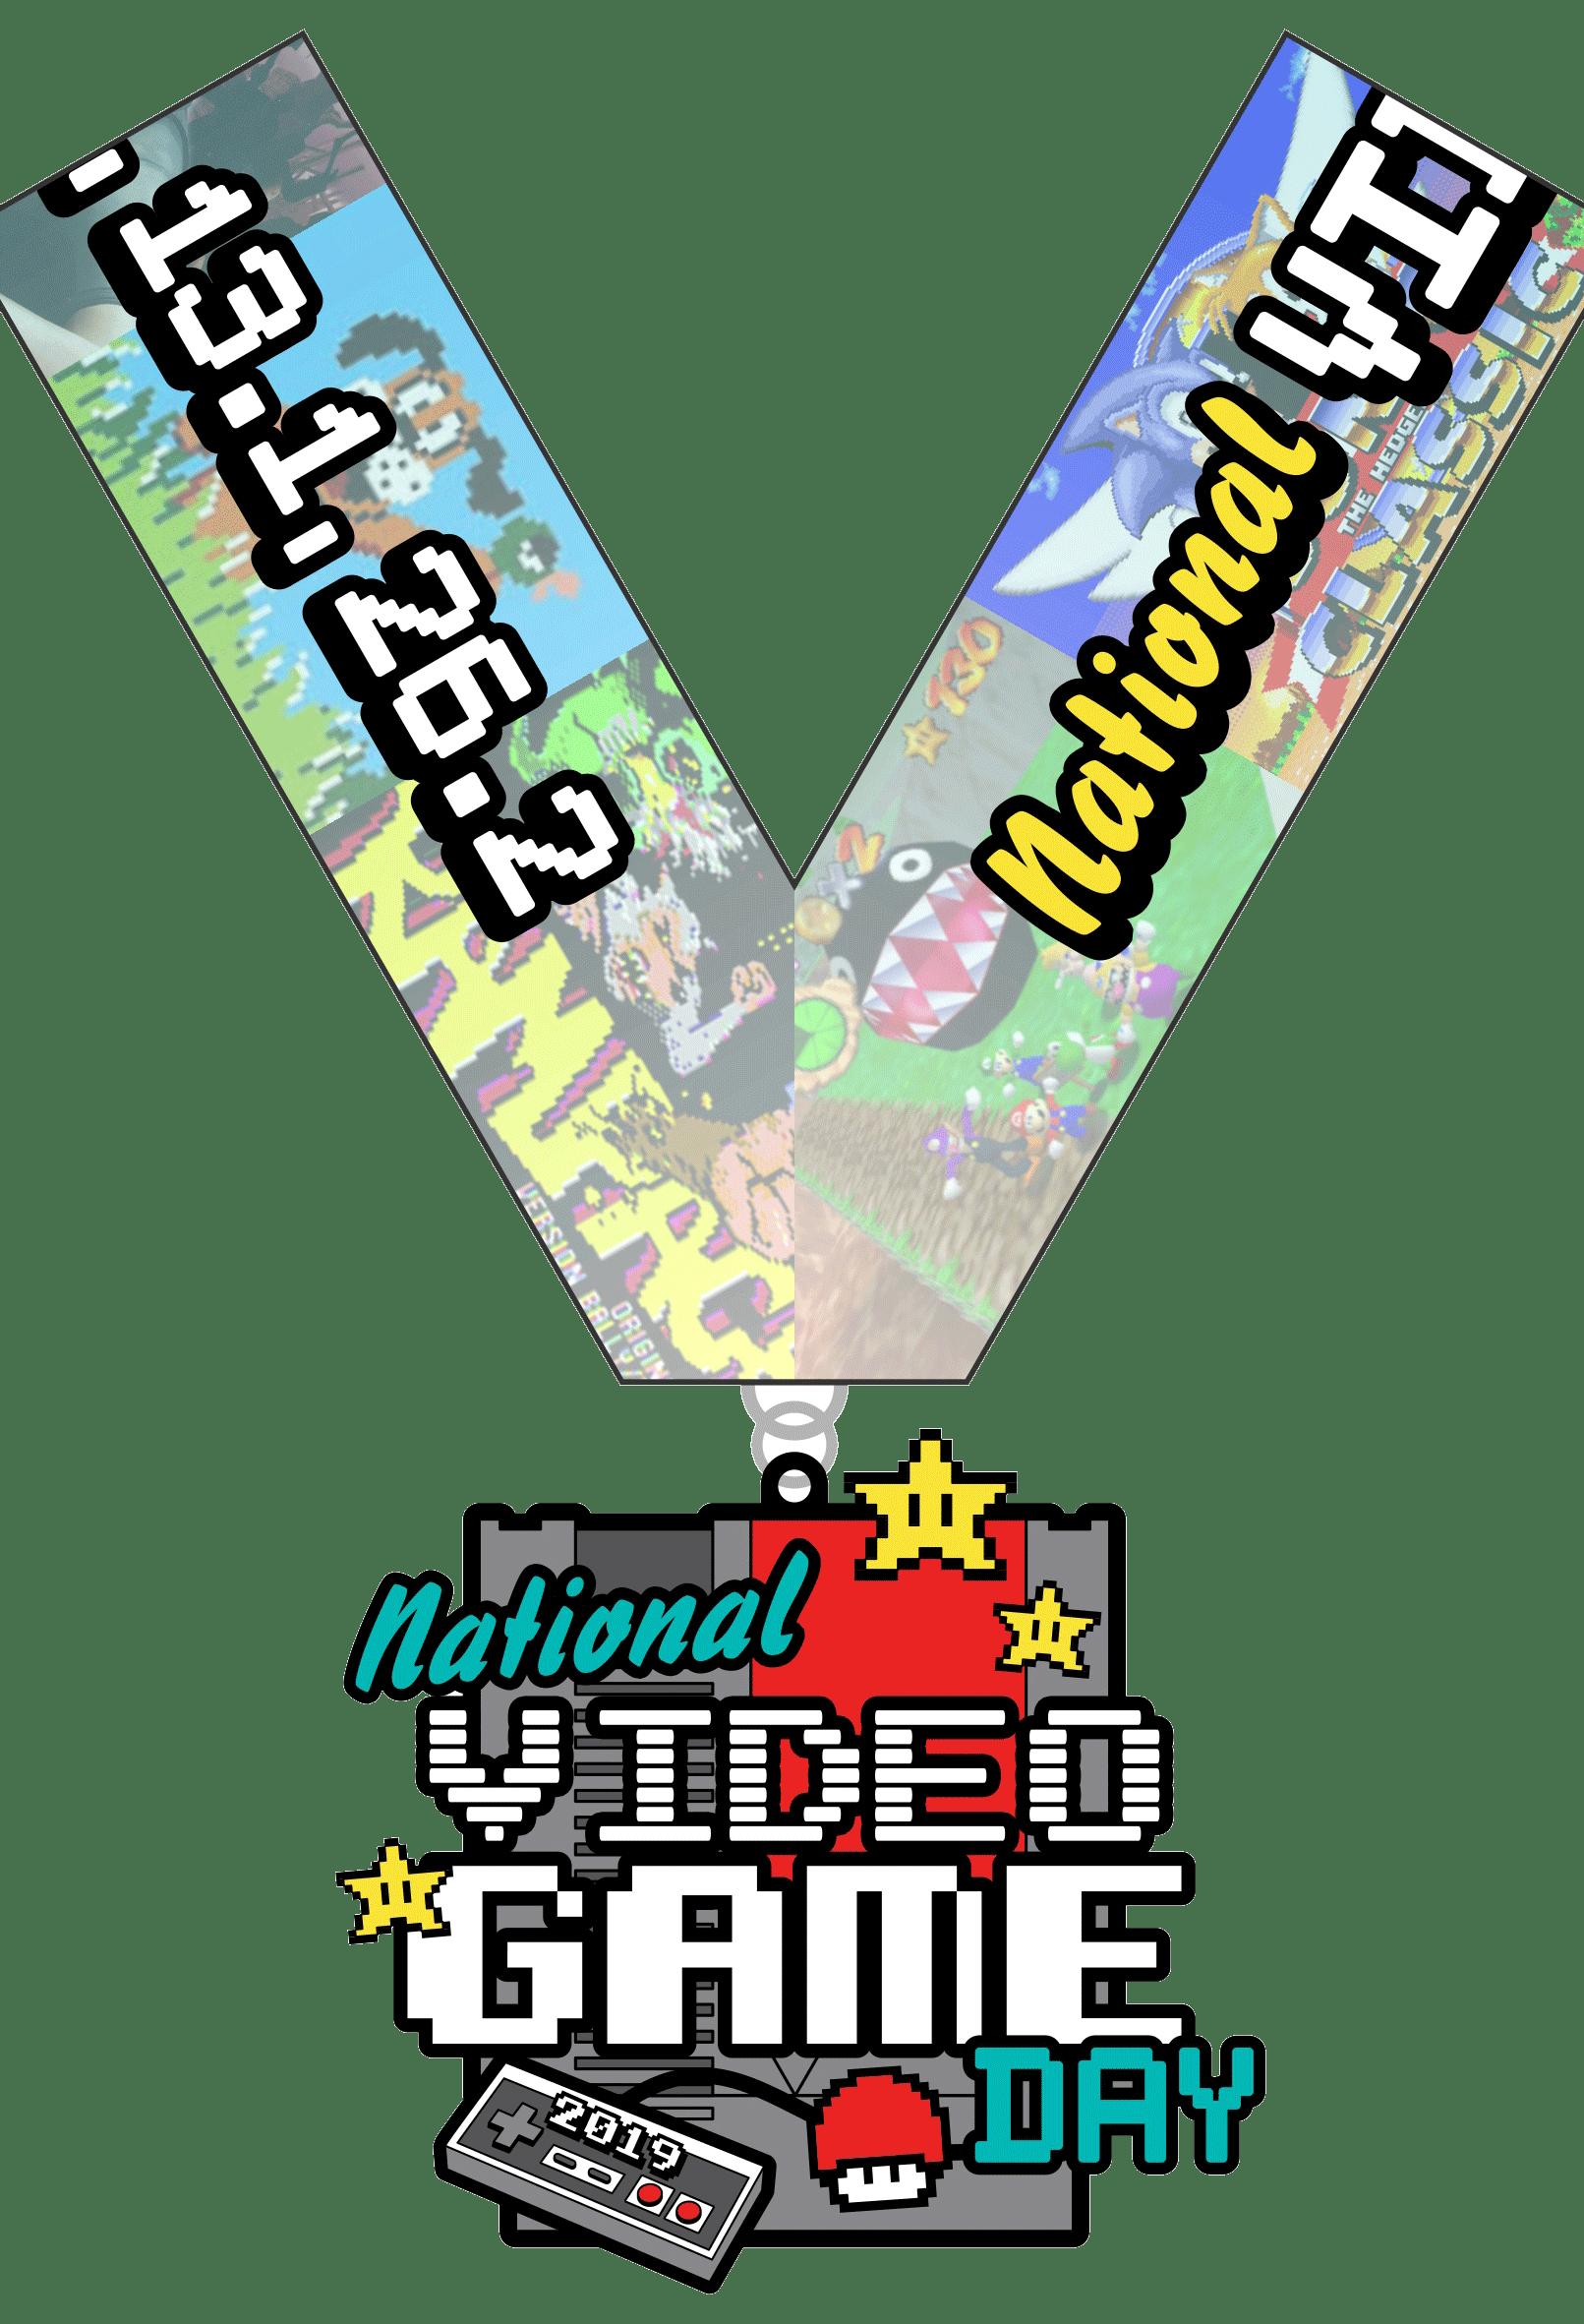 2019 Video Game Day 1 Mile, 5K, 10K, 13.1, 26.2 - Tucson